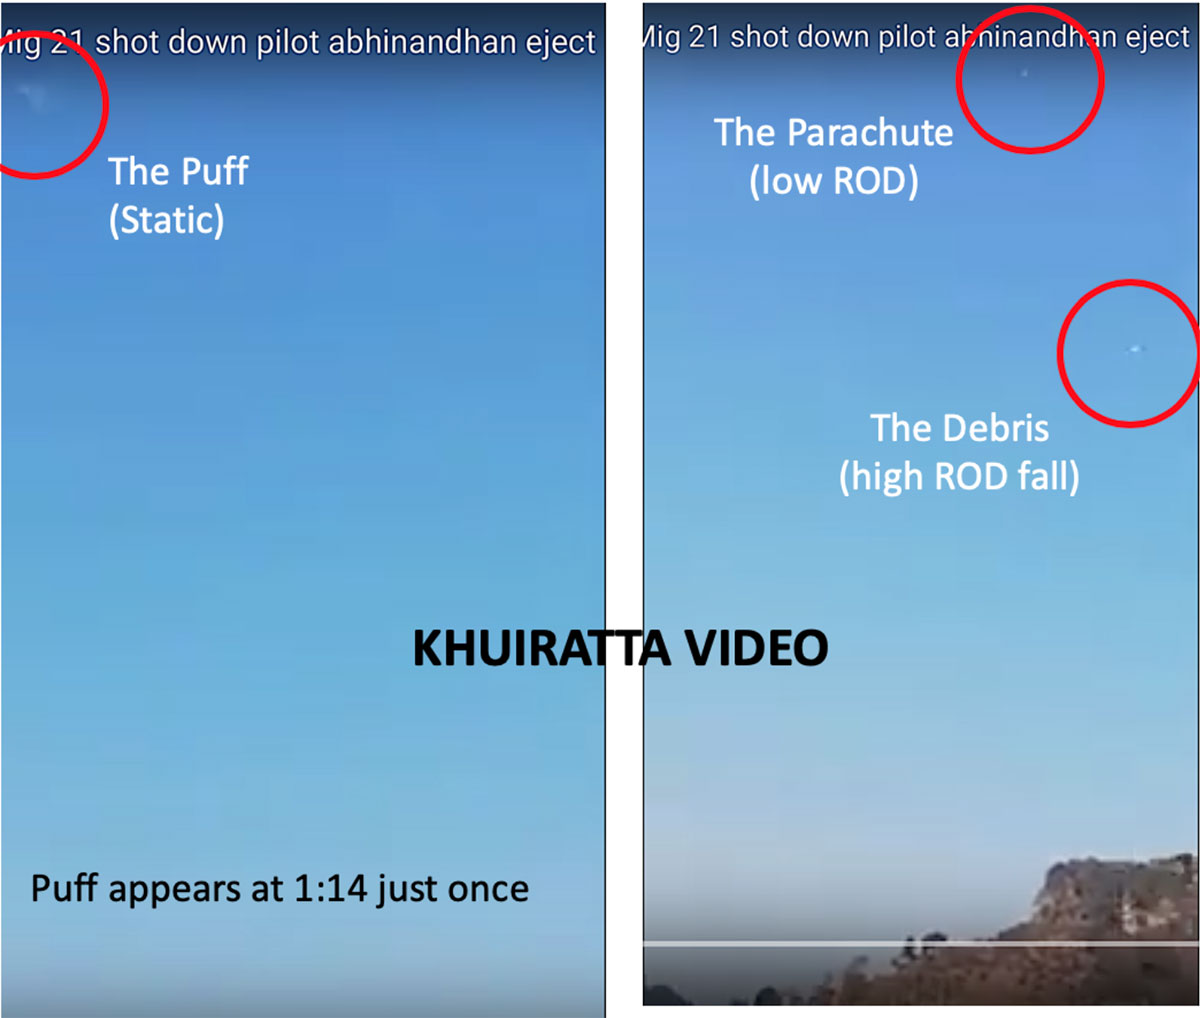 Using Open Source Intelligence (OSINT) to show how IAF's Abhinandan shot down a Pakistani F-16 32